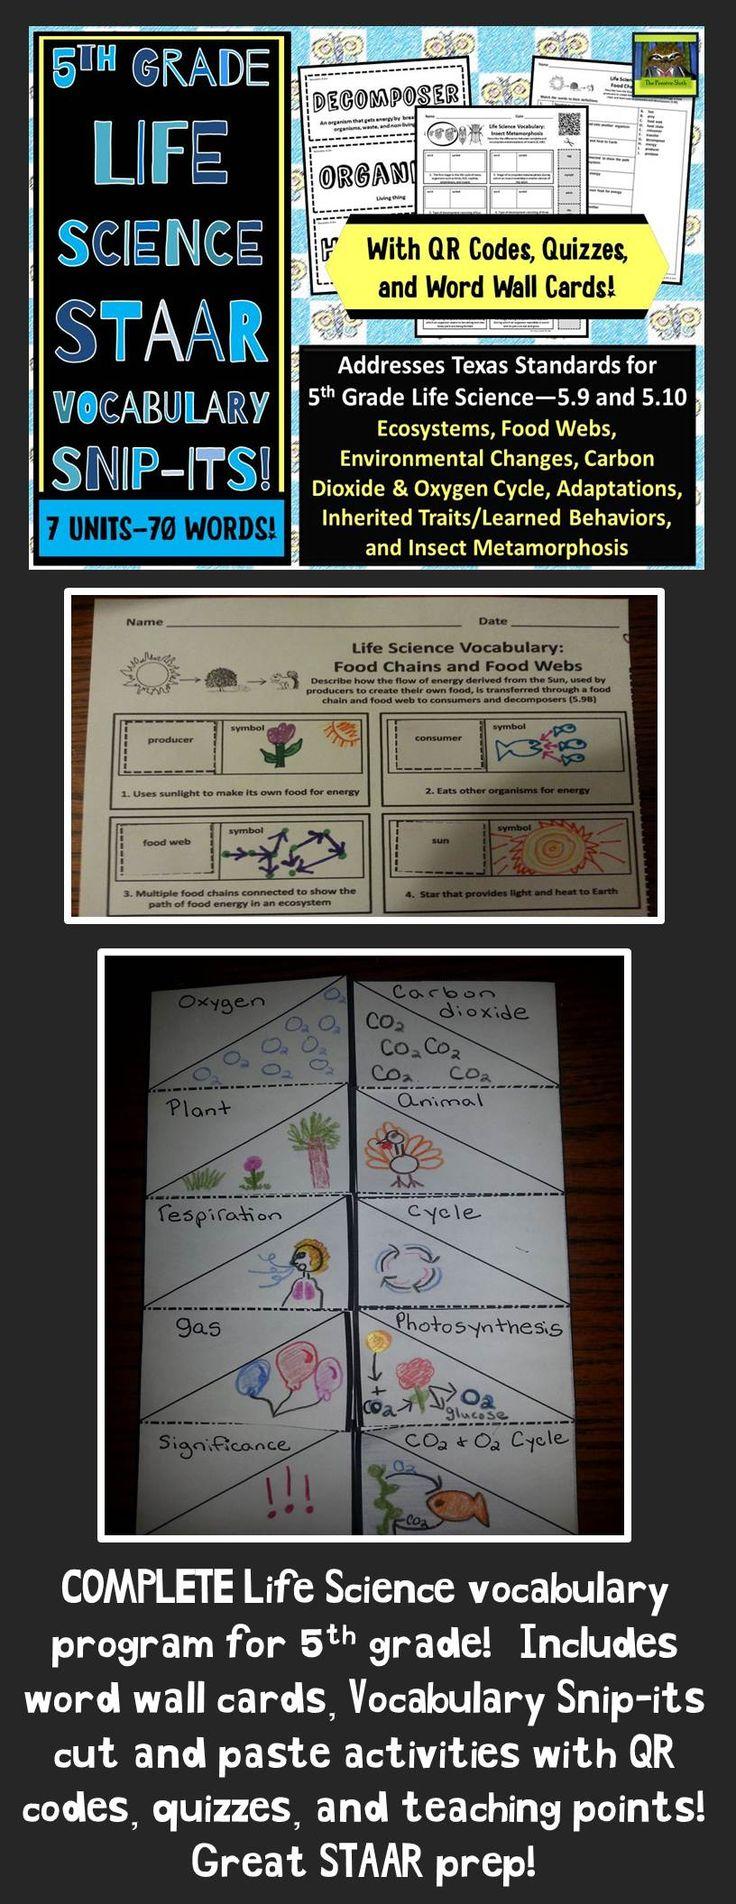 5th Grade Life Science STAARAdaptations, Food Webs